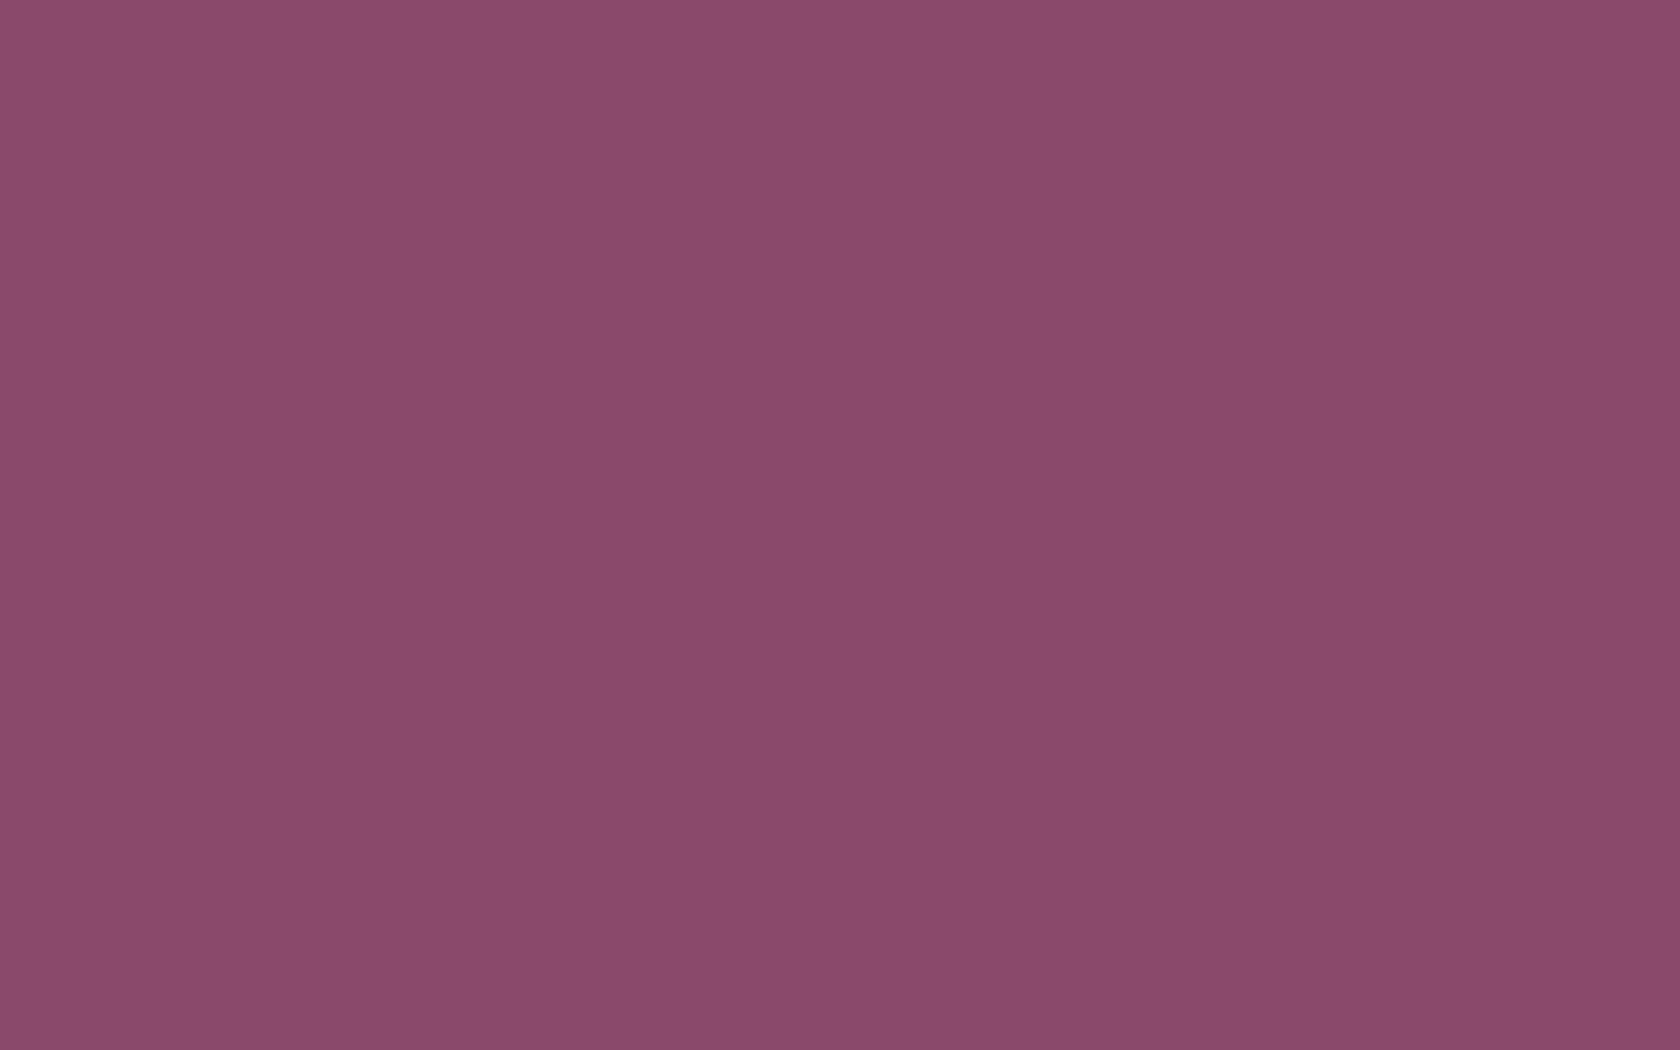 1680x1050 Twilight Lavender Solid Color Background